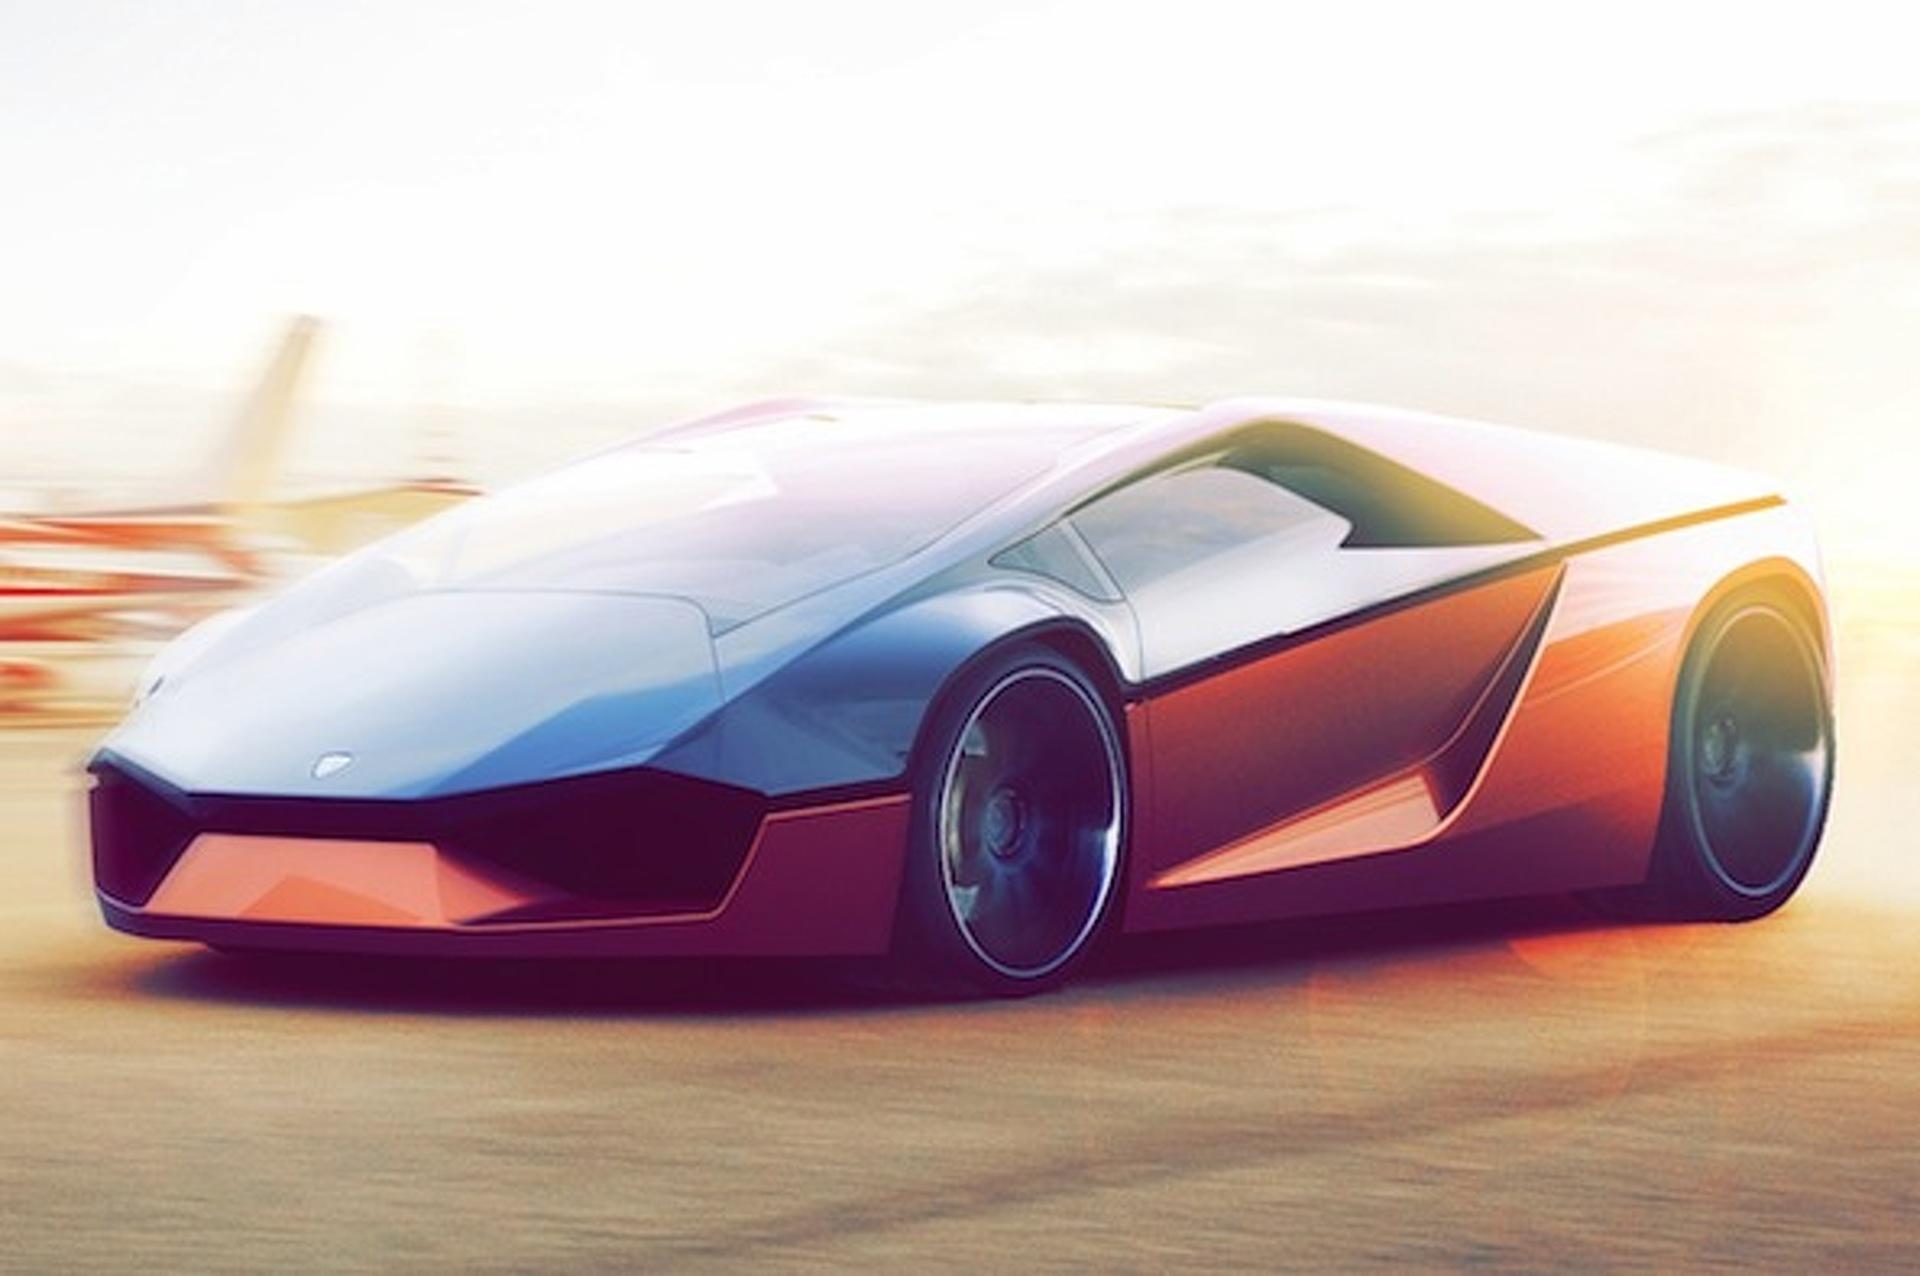 100 Lamborghini Concept Lamborghini Concept Orange